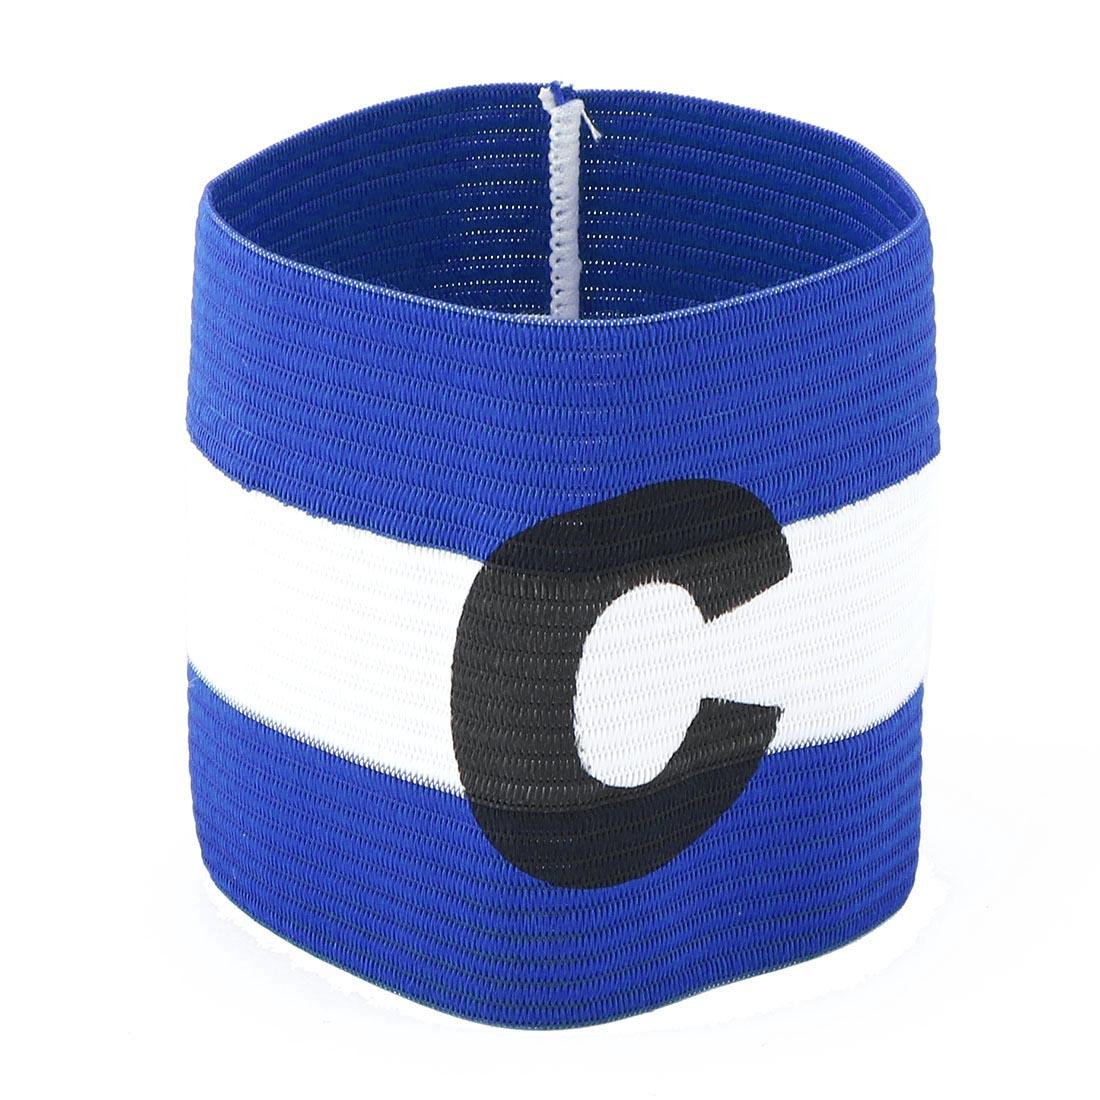 Letter C Printed Football Game Elastic Polyester Armband Blue White